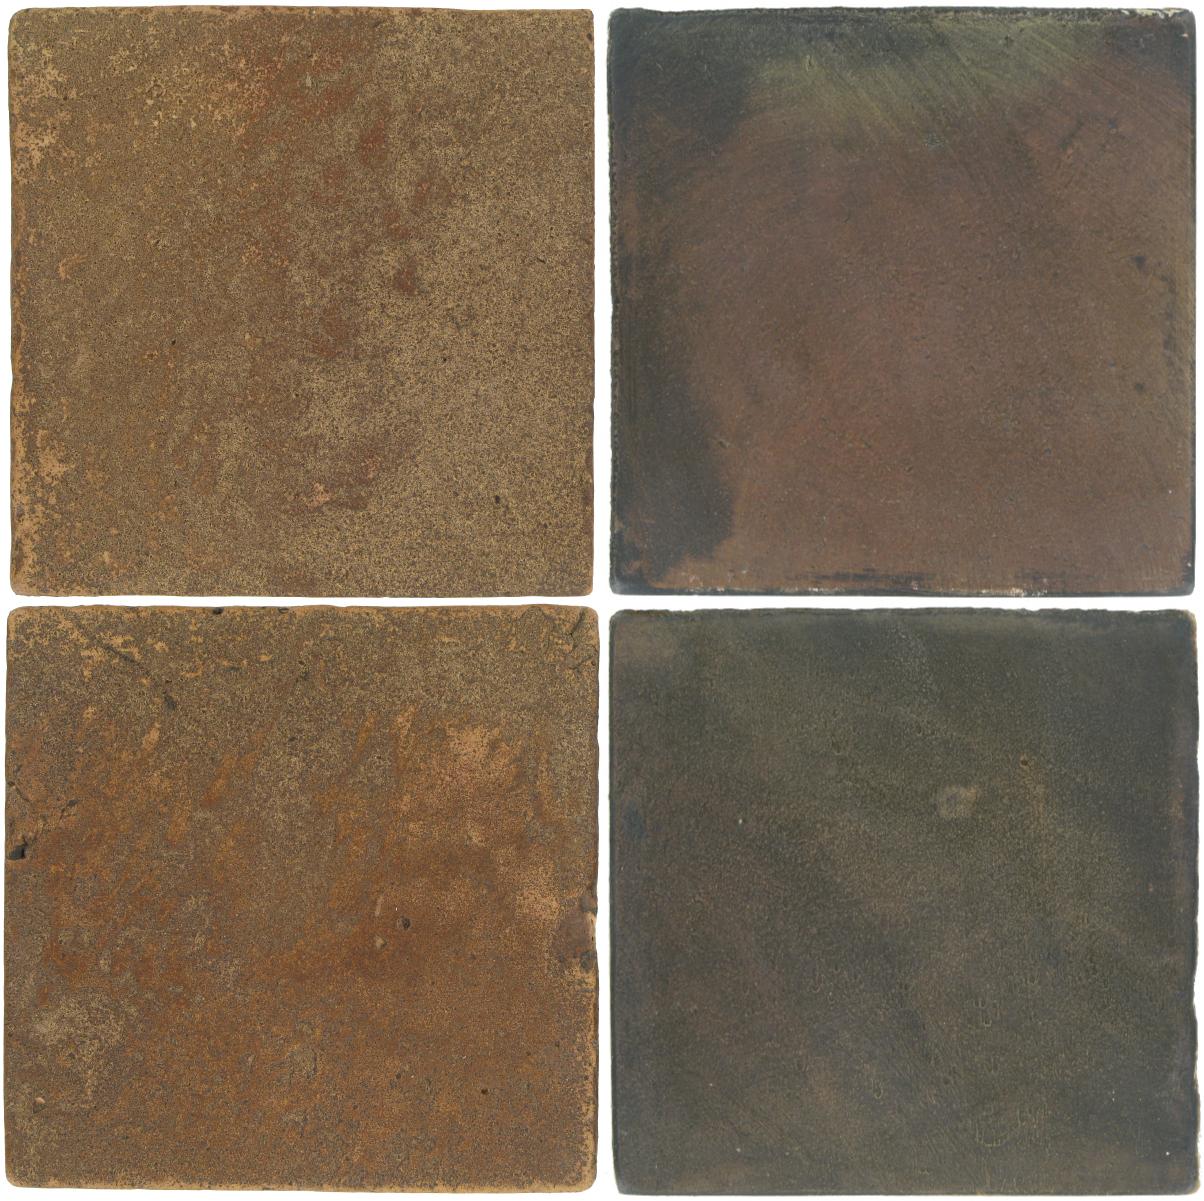 Pedralbes Antique Terracotta  2 Color Combinations  VTG-PSCM Camel Brown + OHS-PSTG Terra Grey